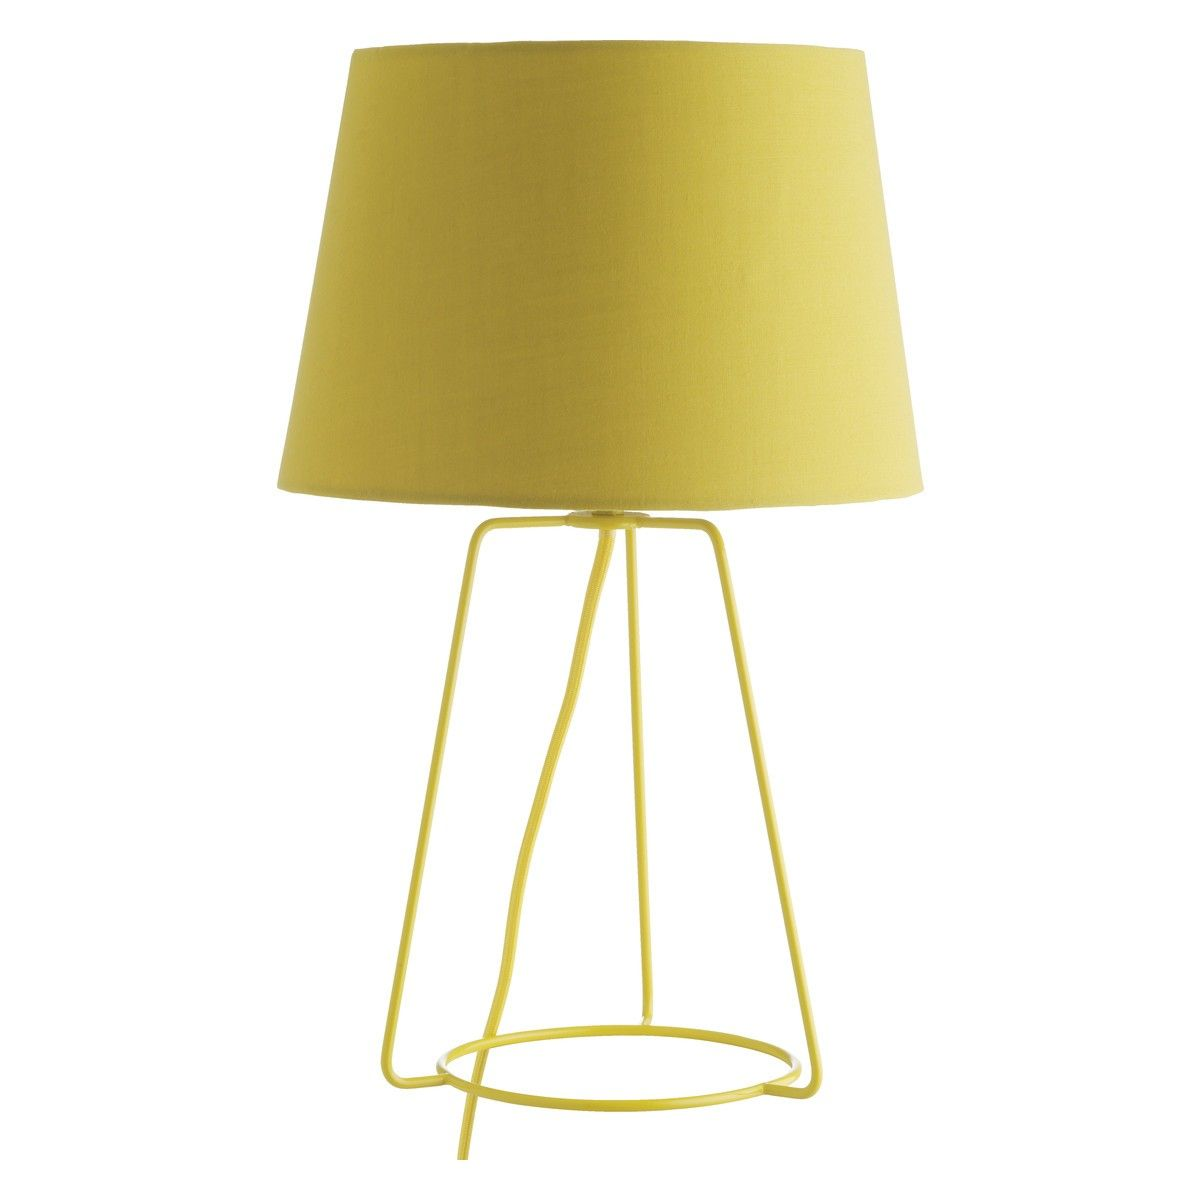 LULA Yellow Metal Table Lamp With Fabric Shade